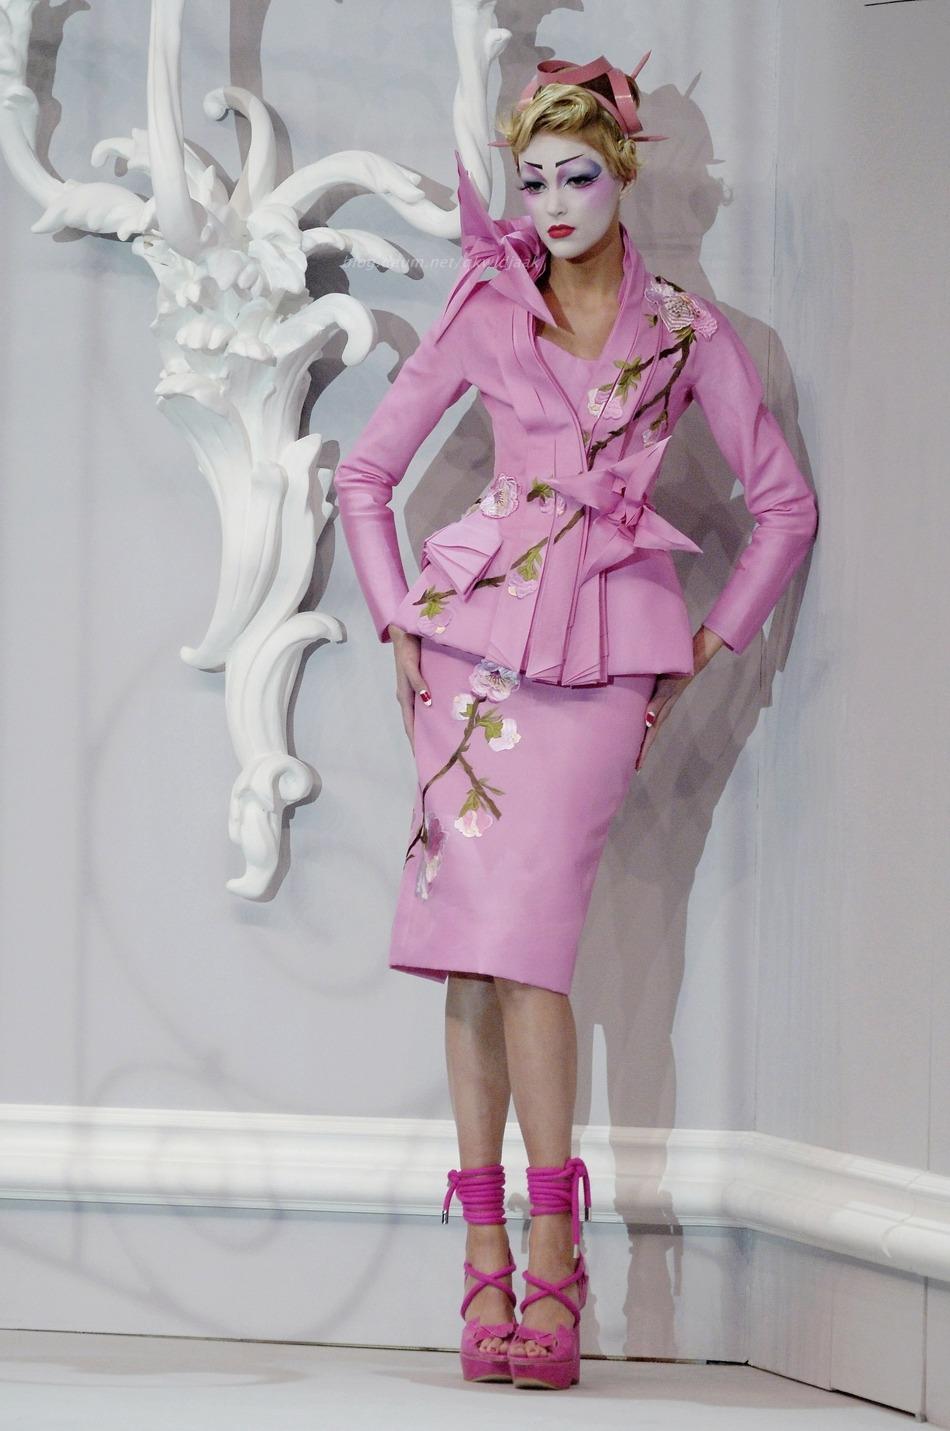 Christian Dior Spring/Summer 2007 Haute Couture Paris